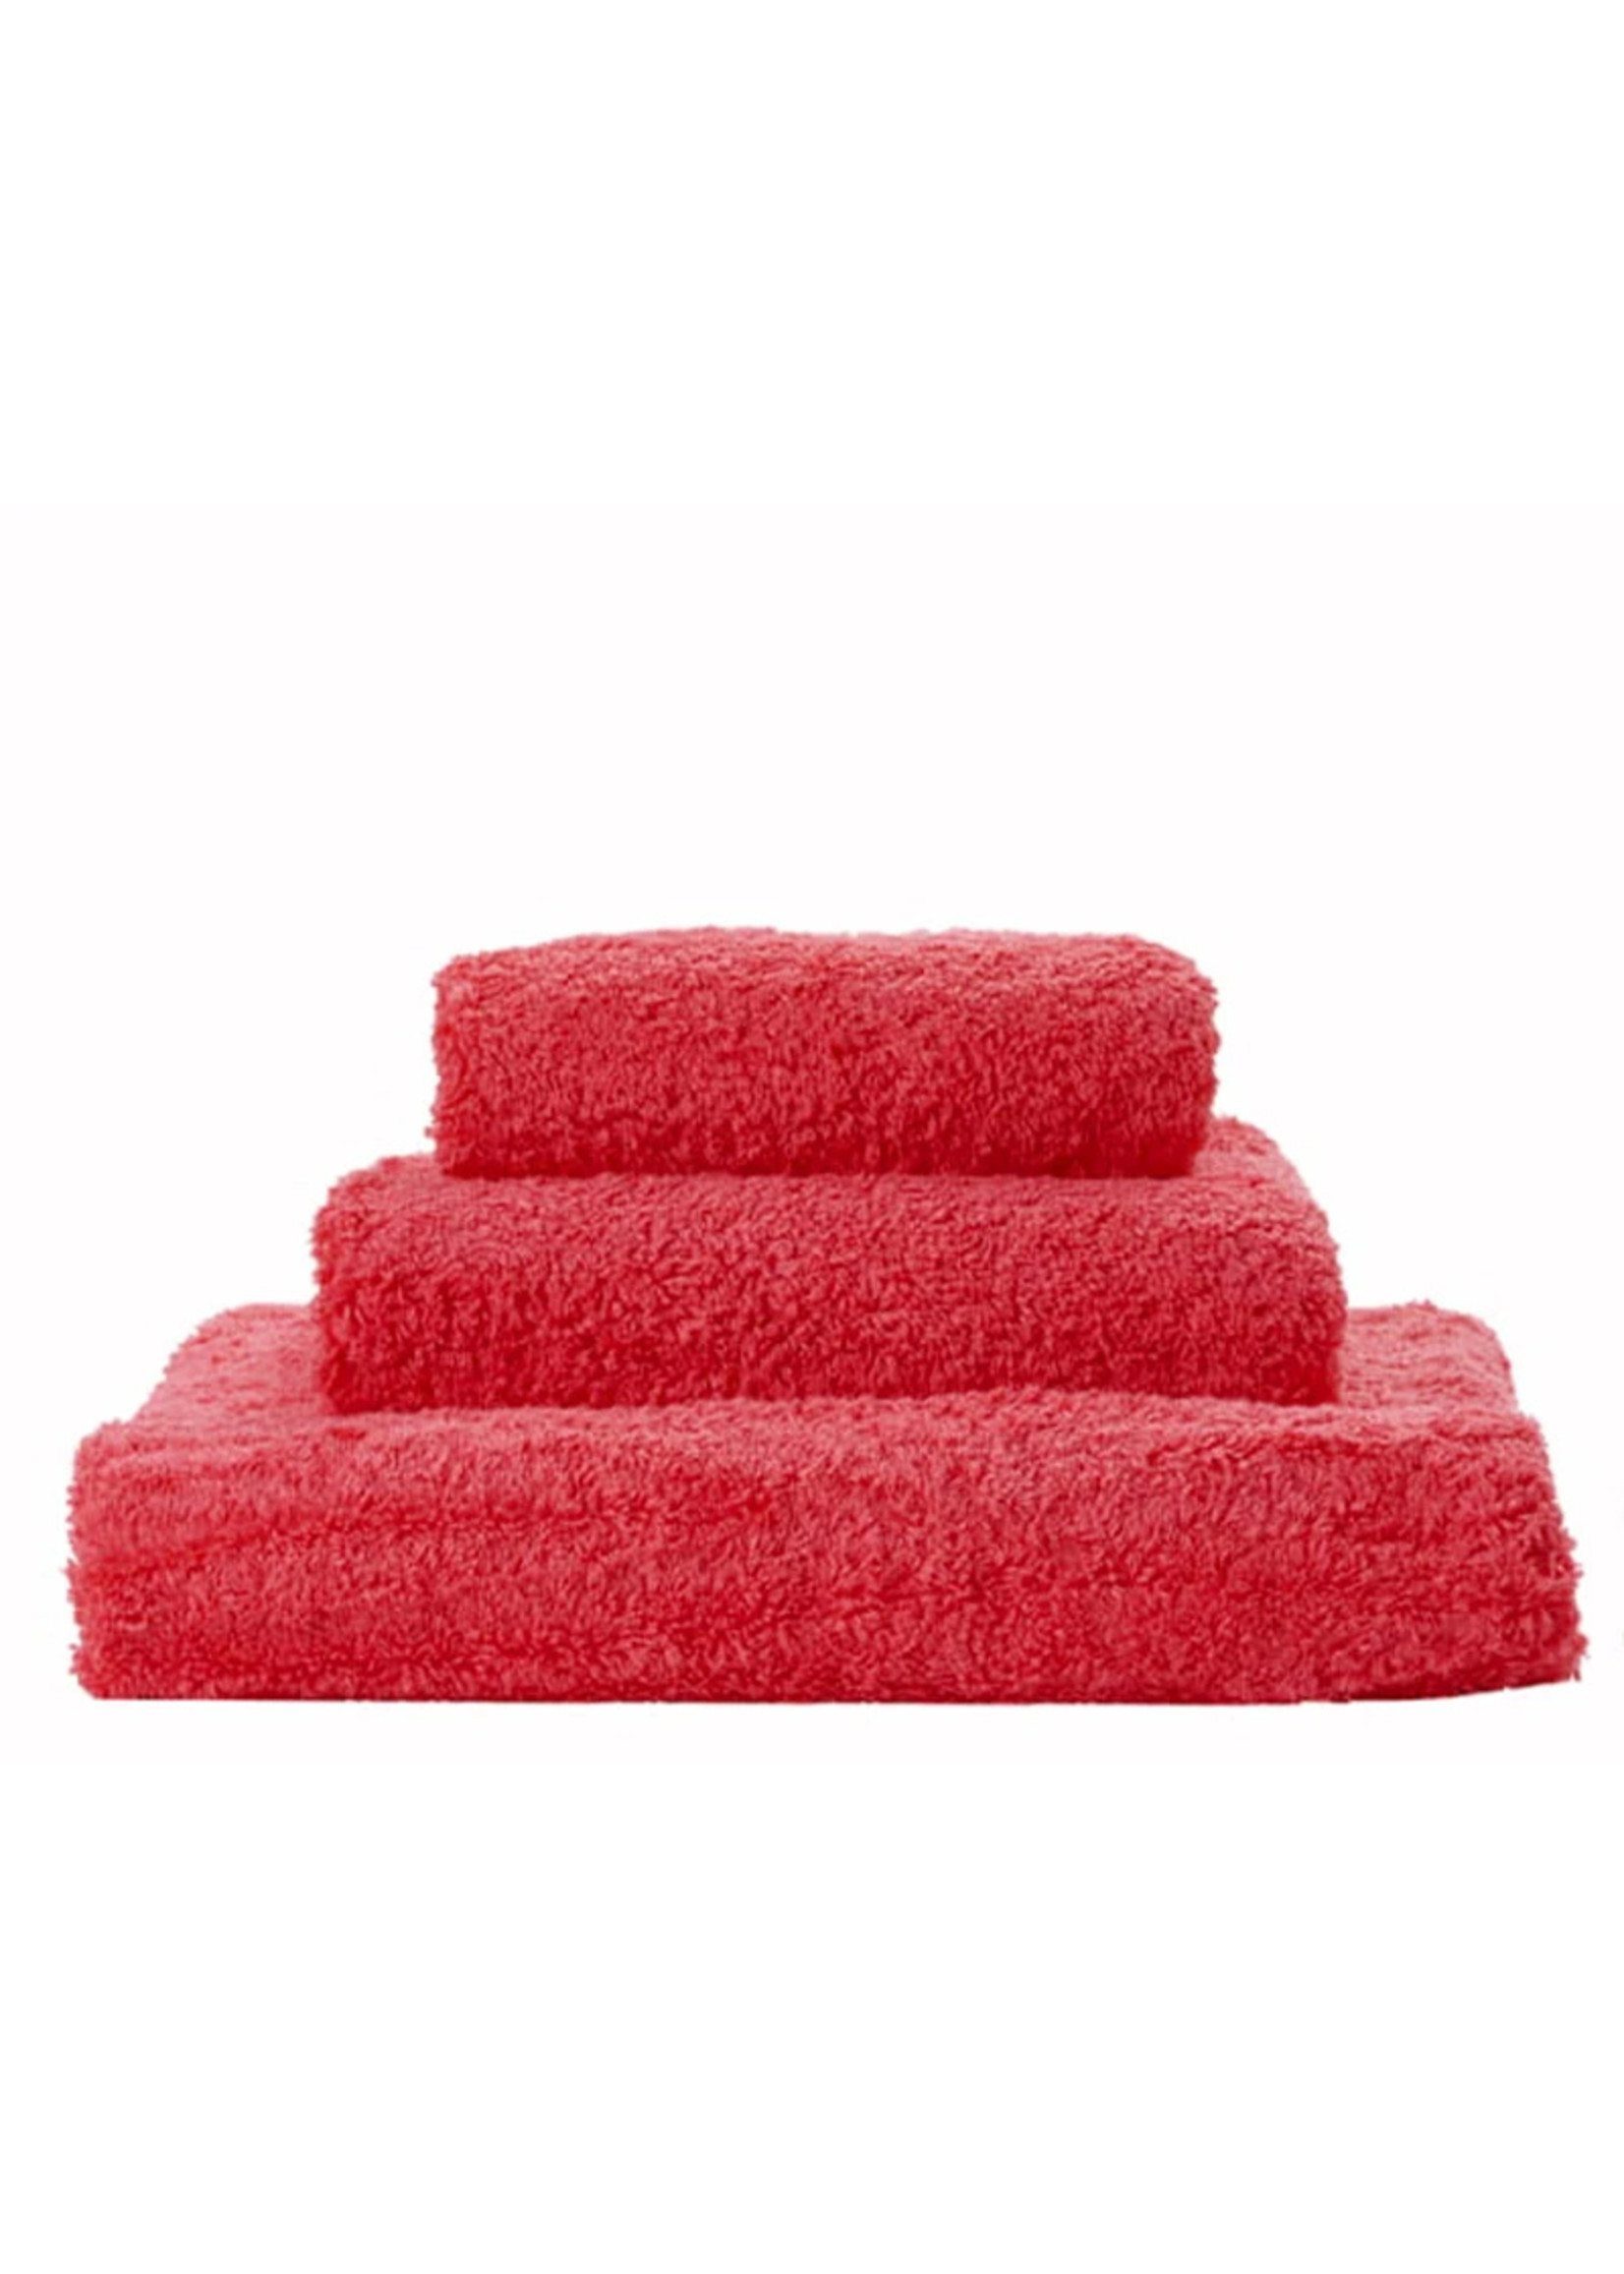 Abyss & Habidecor Super Pile Grenadine Towels